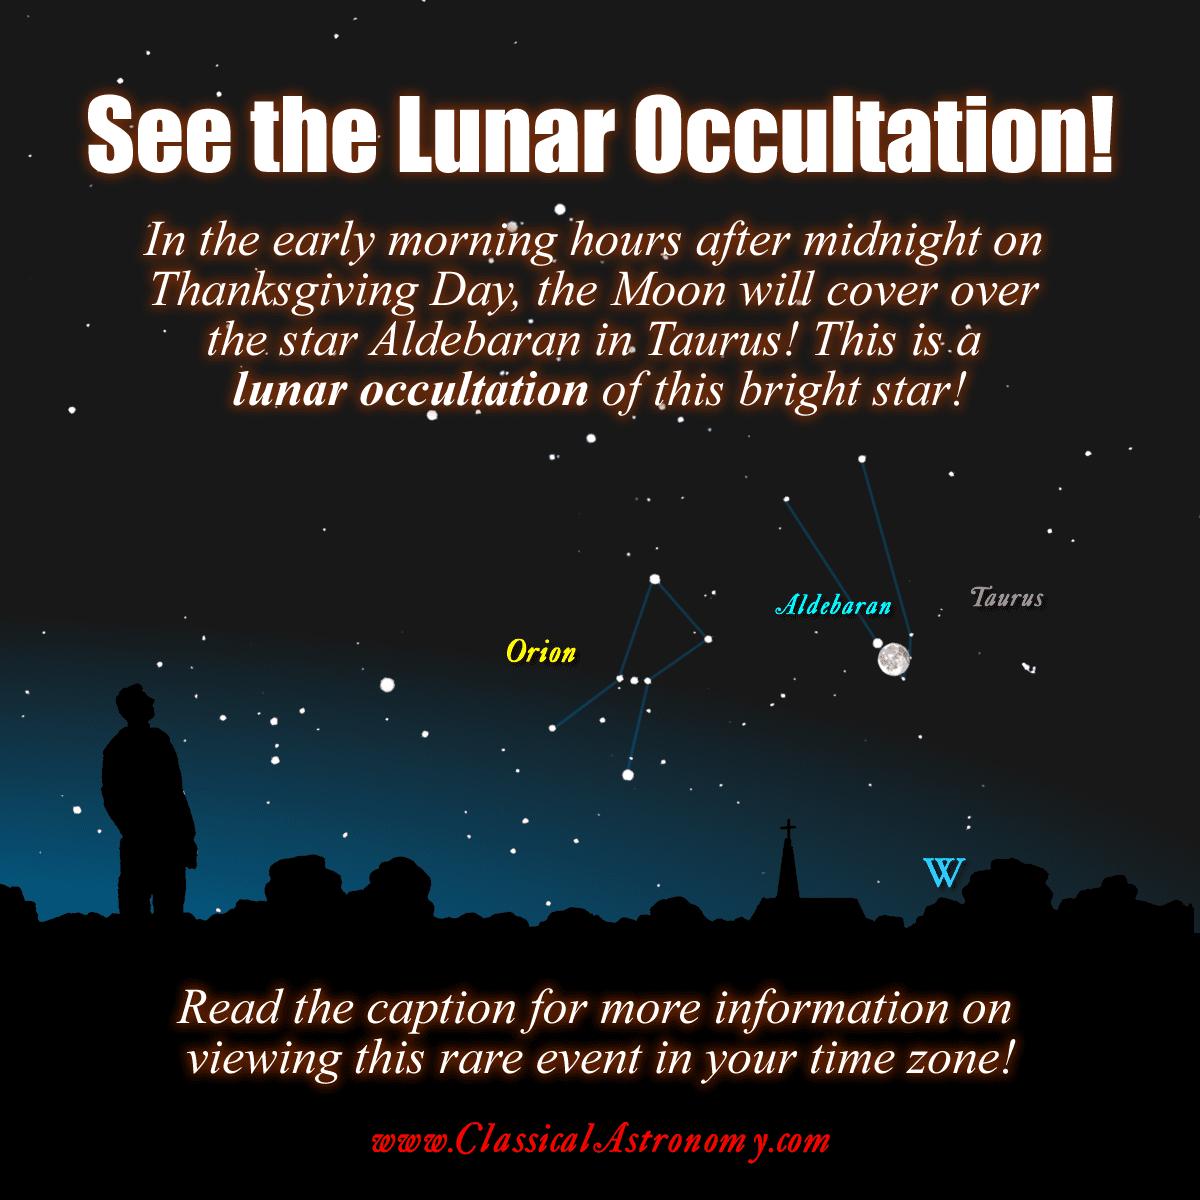 2015-11-LunarOccultationAldebaran